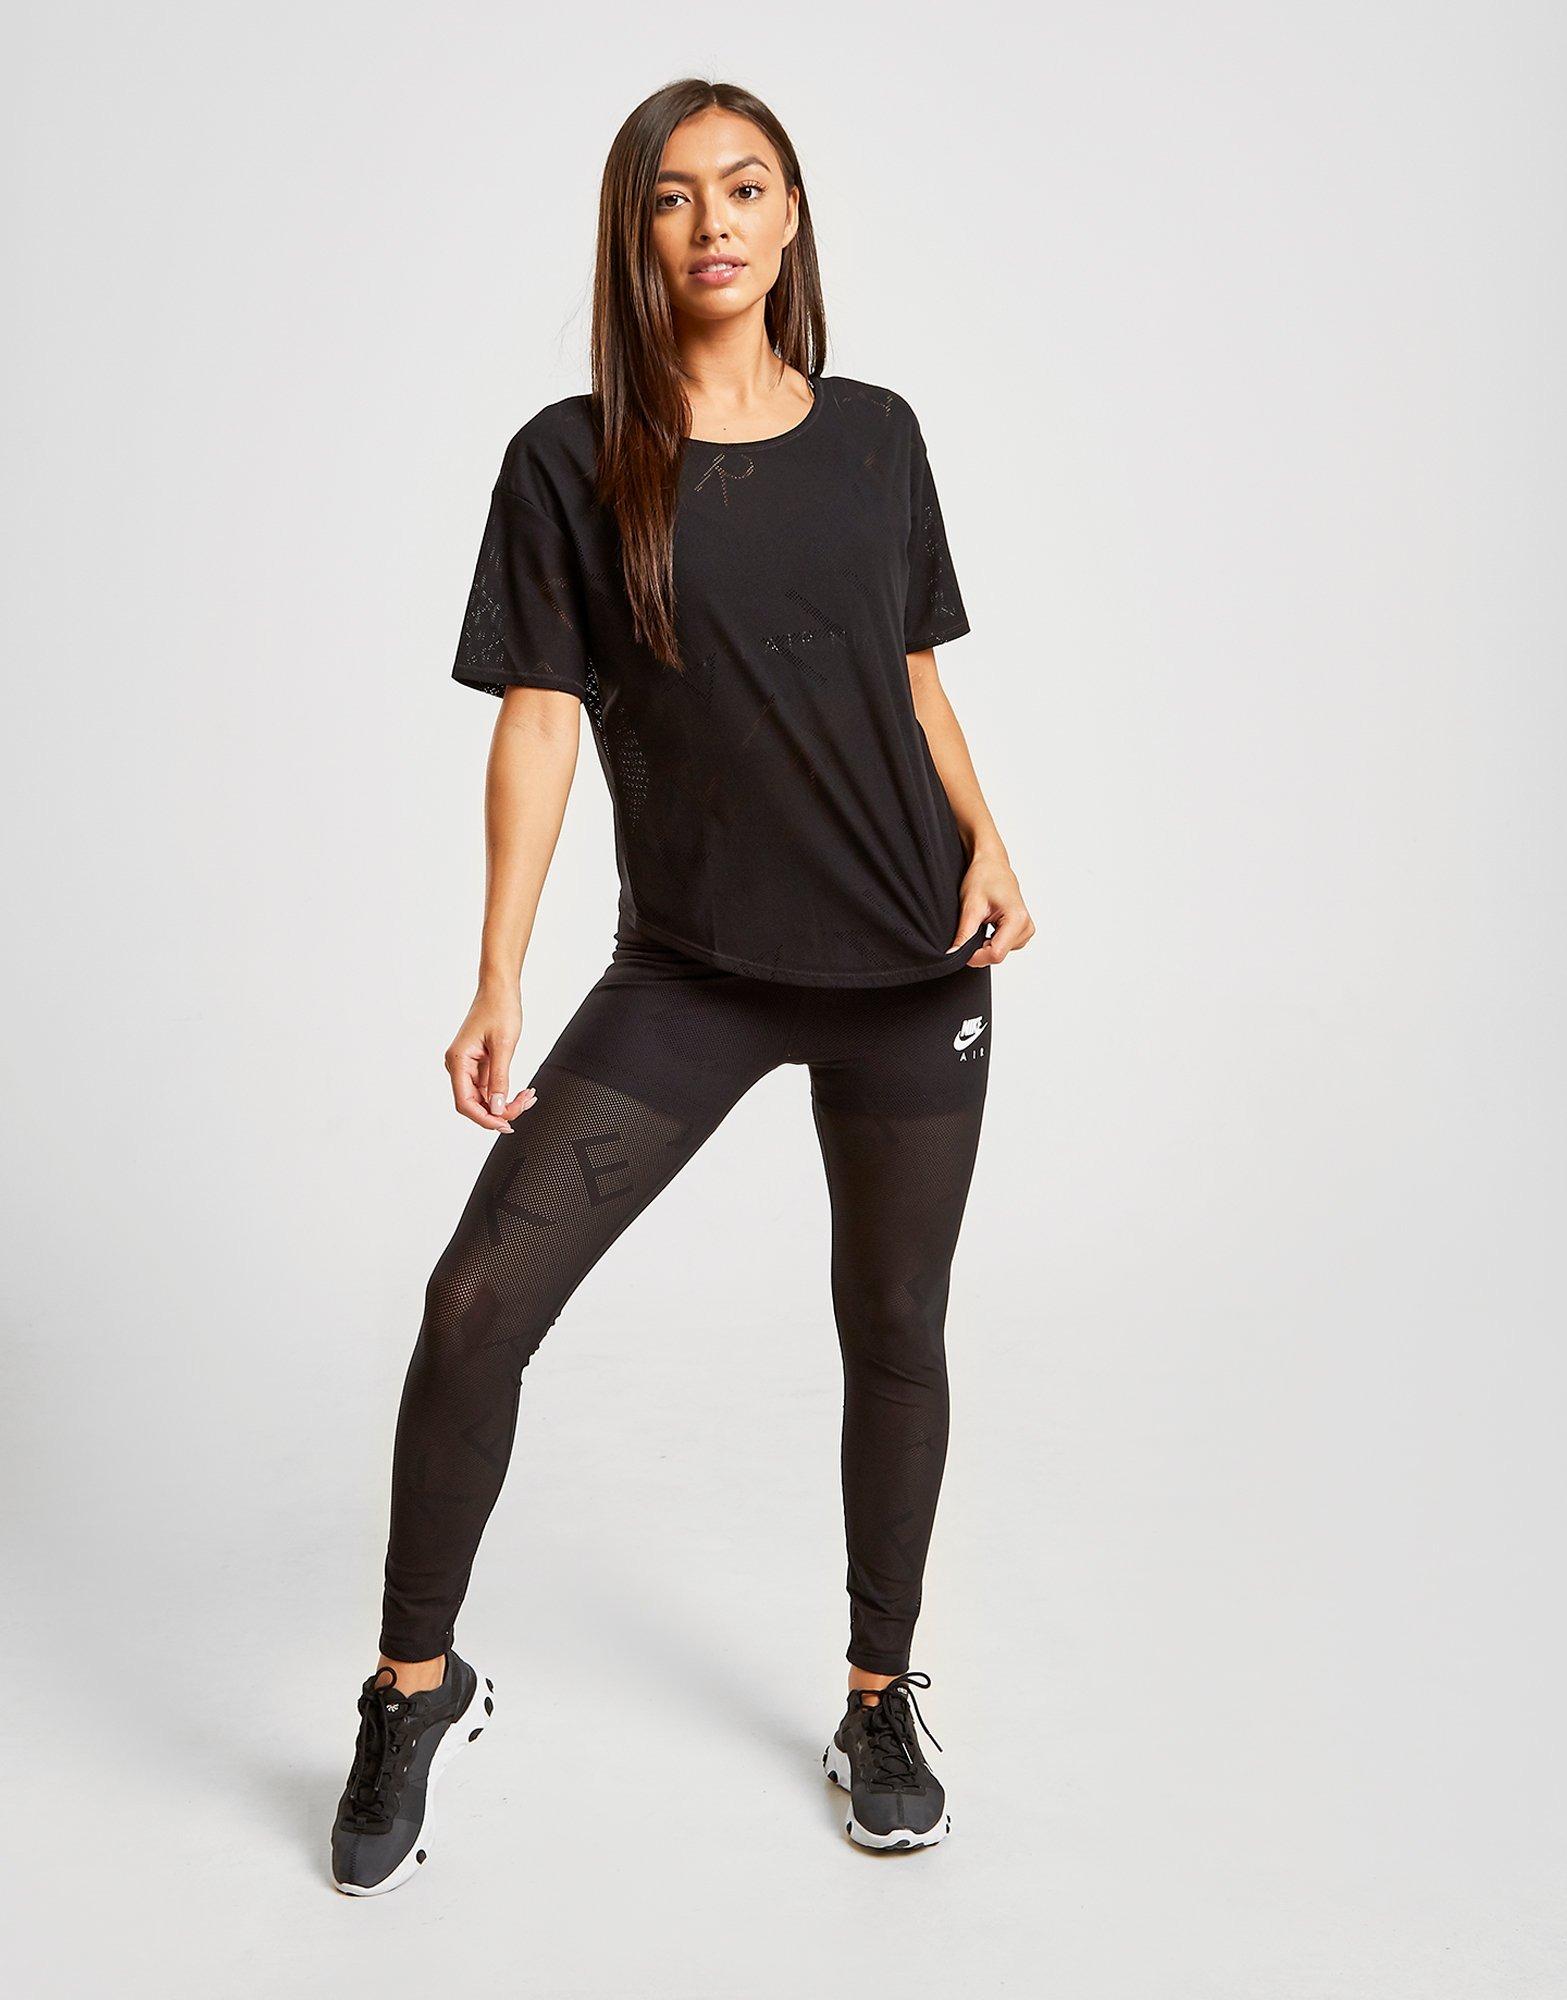 estilos frescos bajo costo zapatos para correr Nike camiseta Air running para mujer | JD Sports